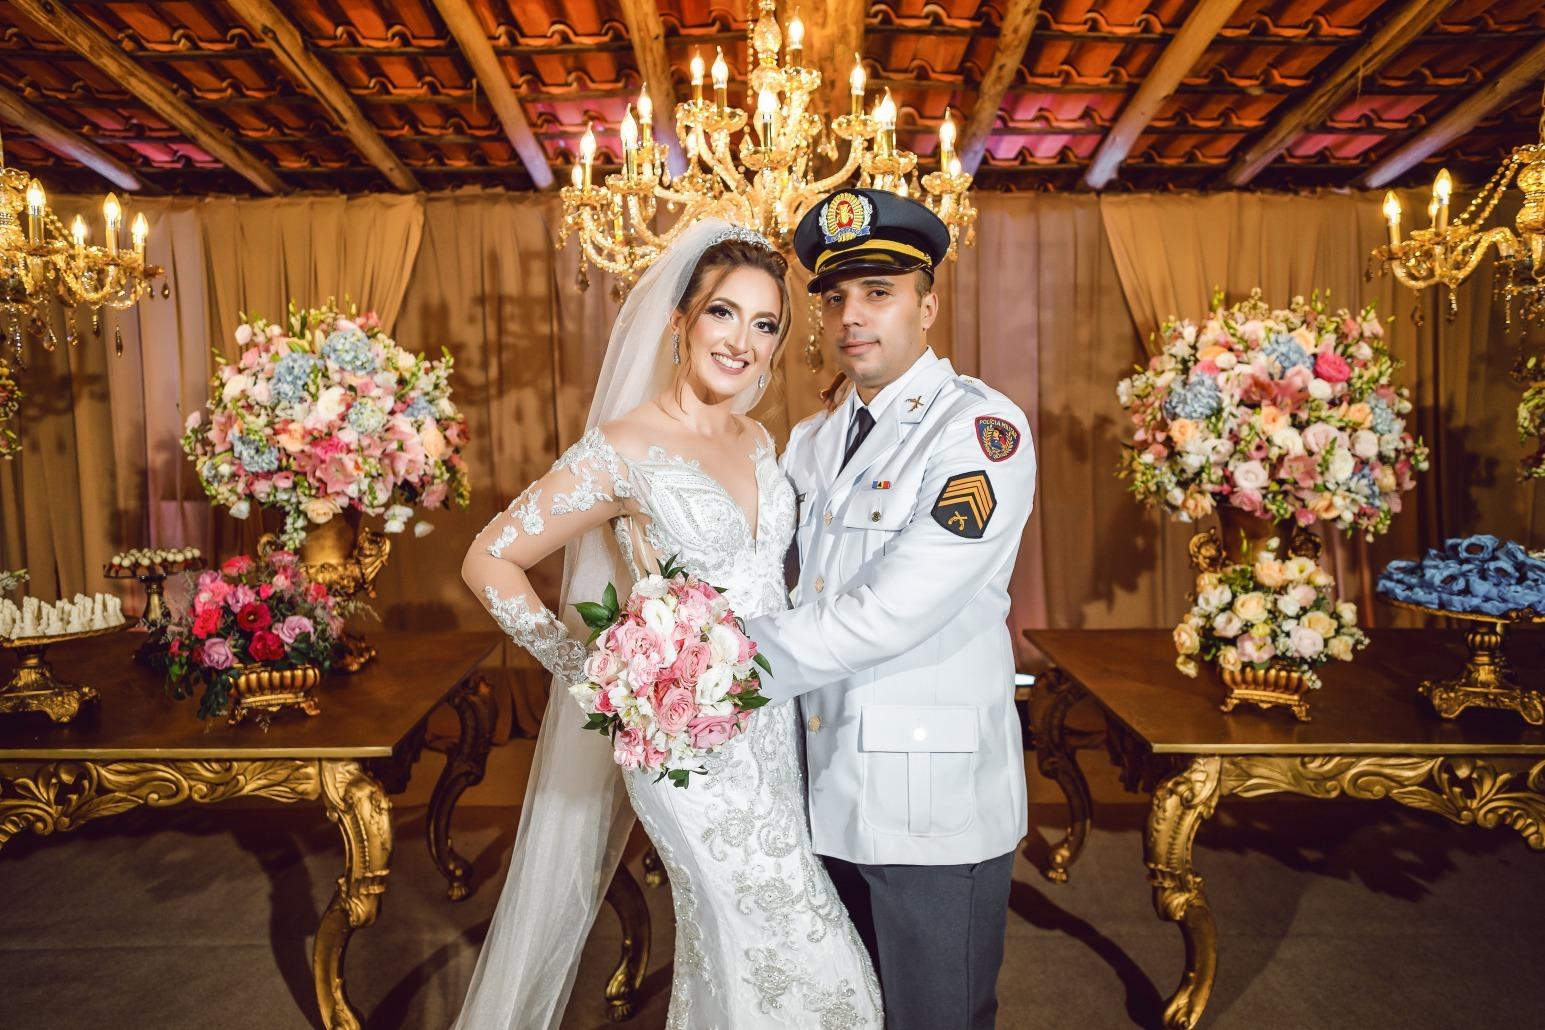 Casamento em Mateus Leme - Sheila e Breenner - Zephora Alta Costura - Foto Demetrio Laurentys